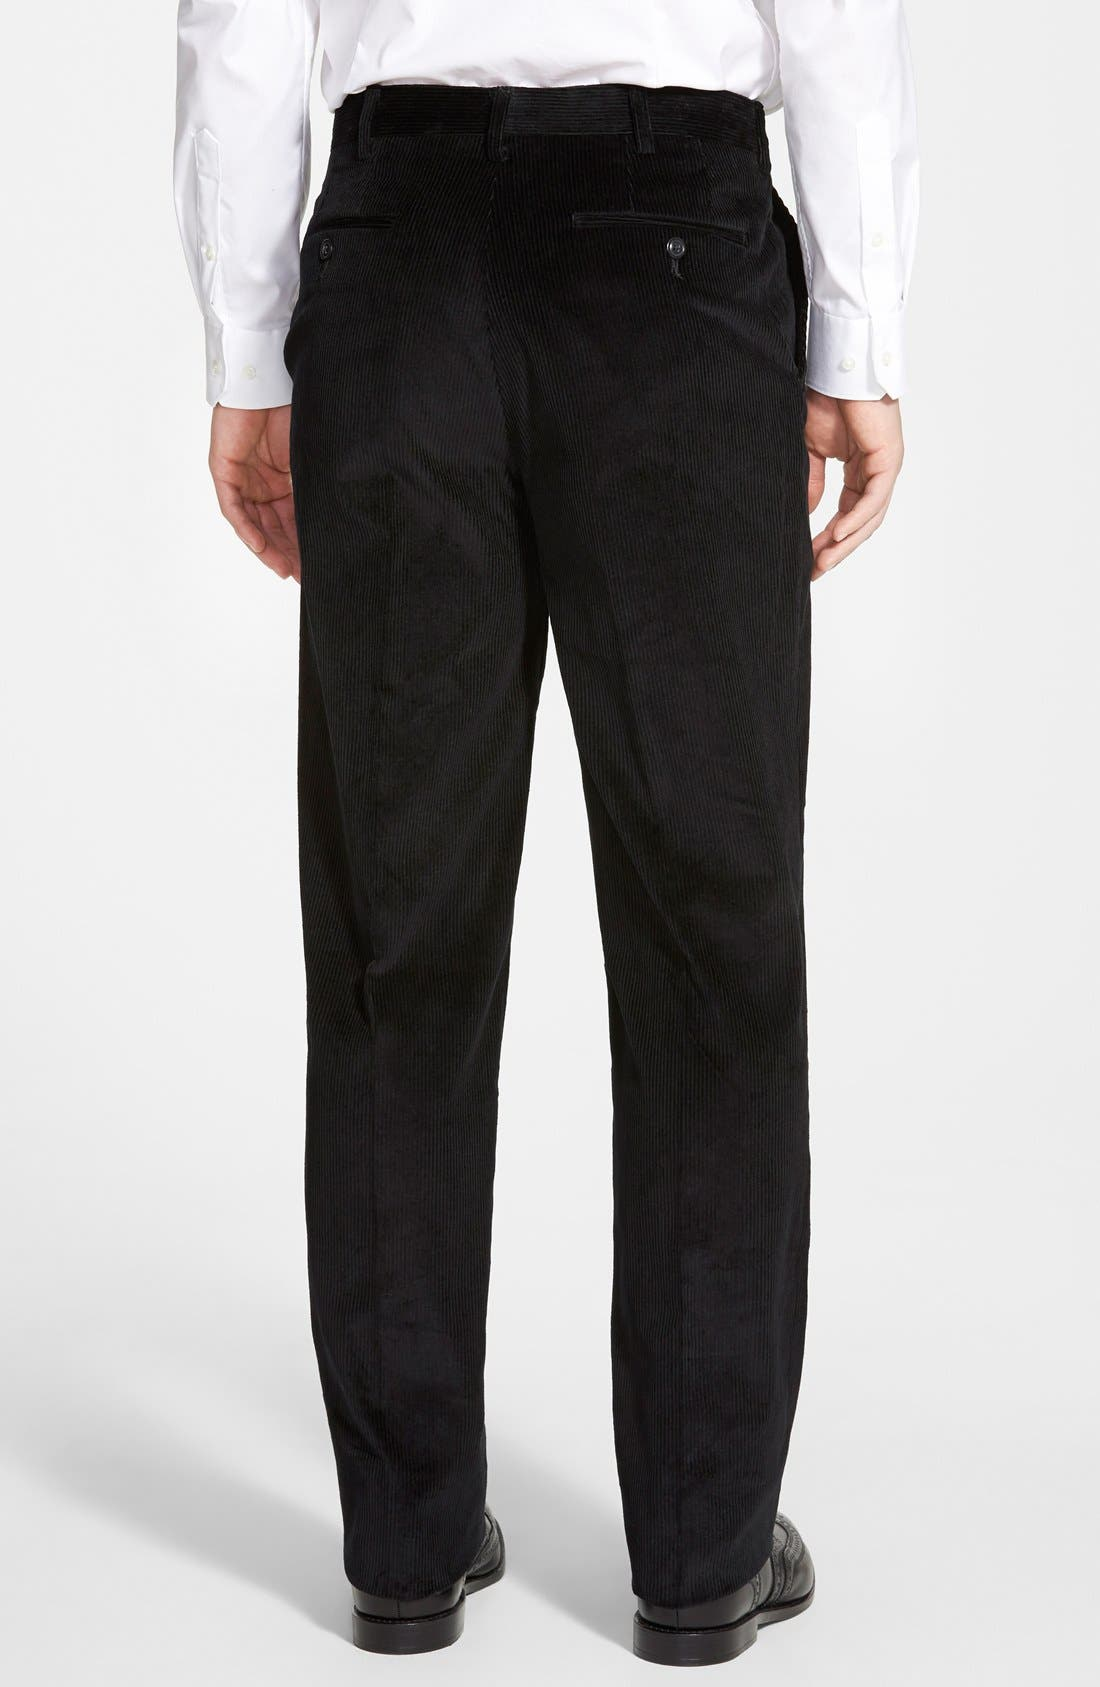 Flat Front Corduroy Trousers,                             Alternate thumbnail 2, color,                             Black